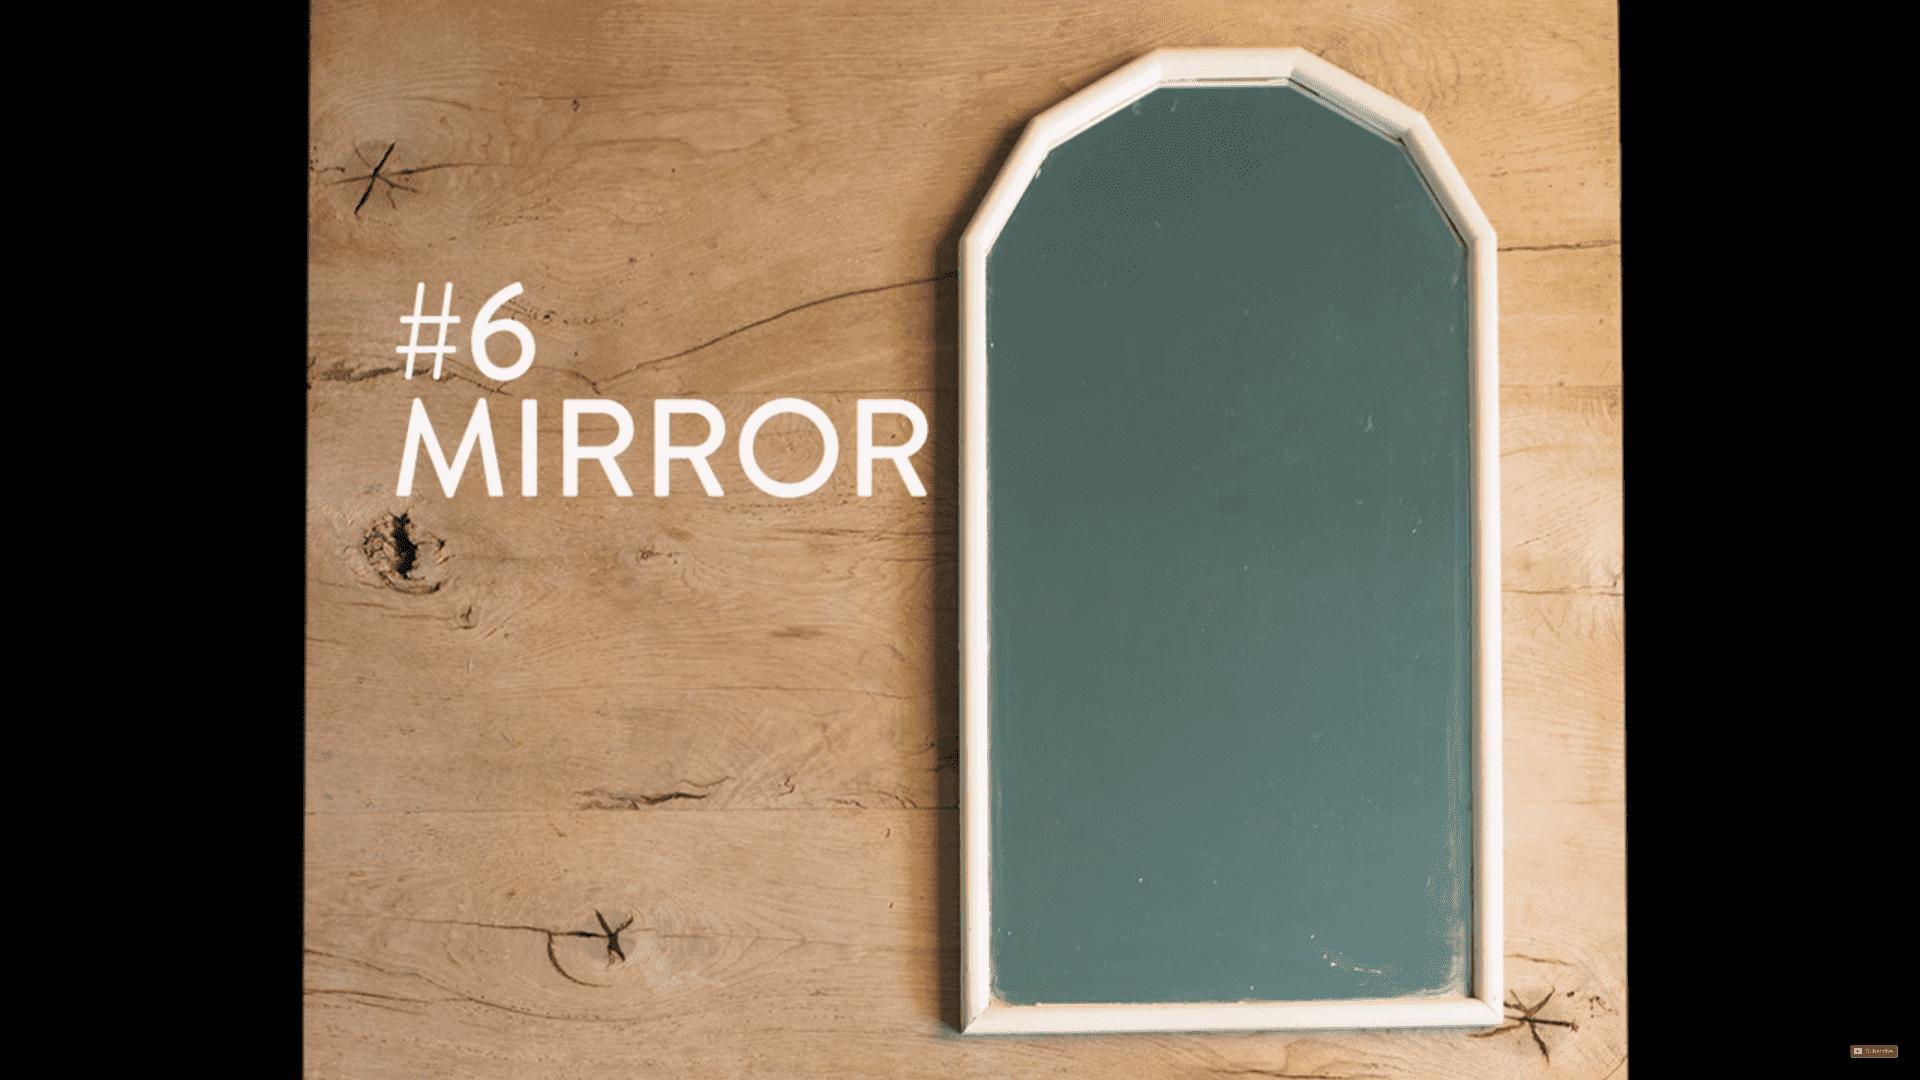 mirror1 min image